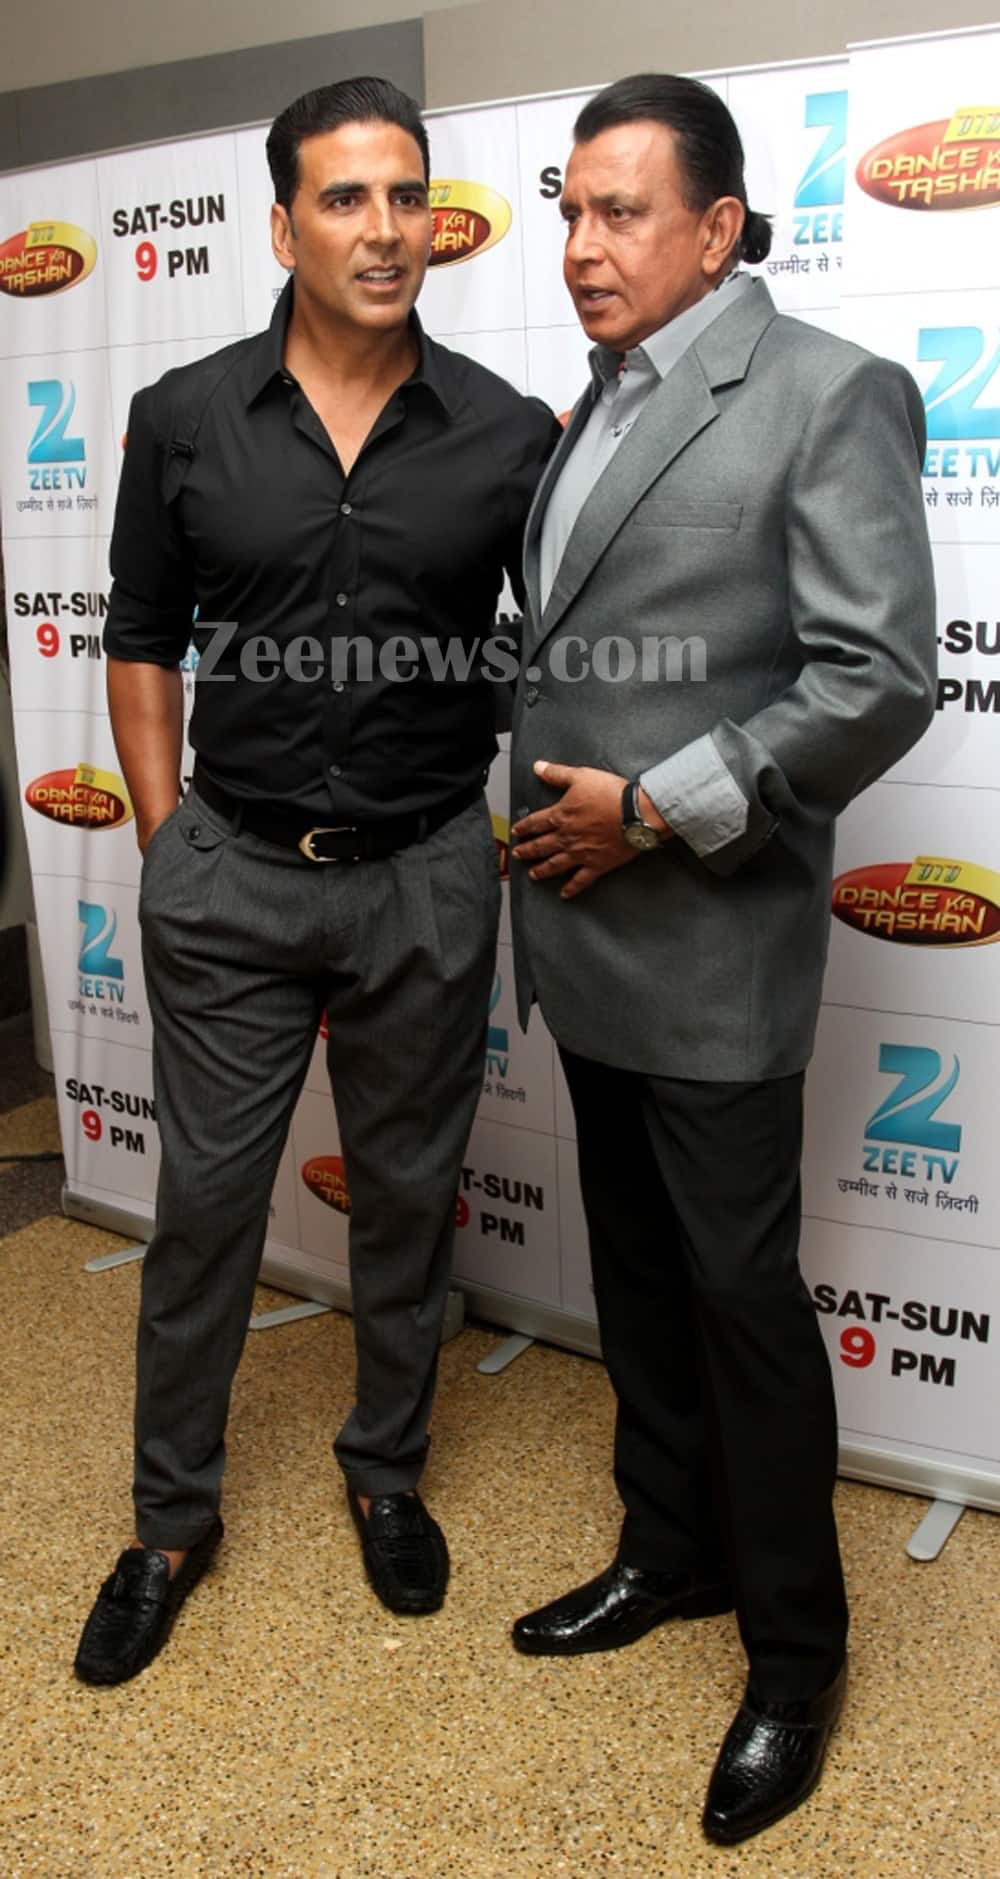 Akshay Kumar and Mithun Chakraborty address the media before the shoot for 'Zee TV's Dance Ka Tashan'.